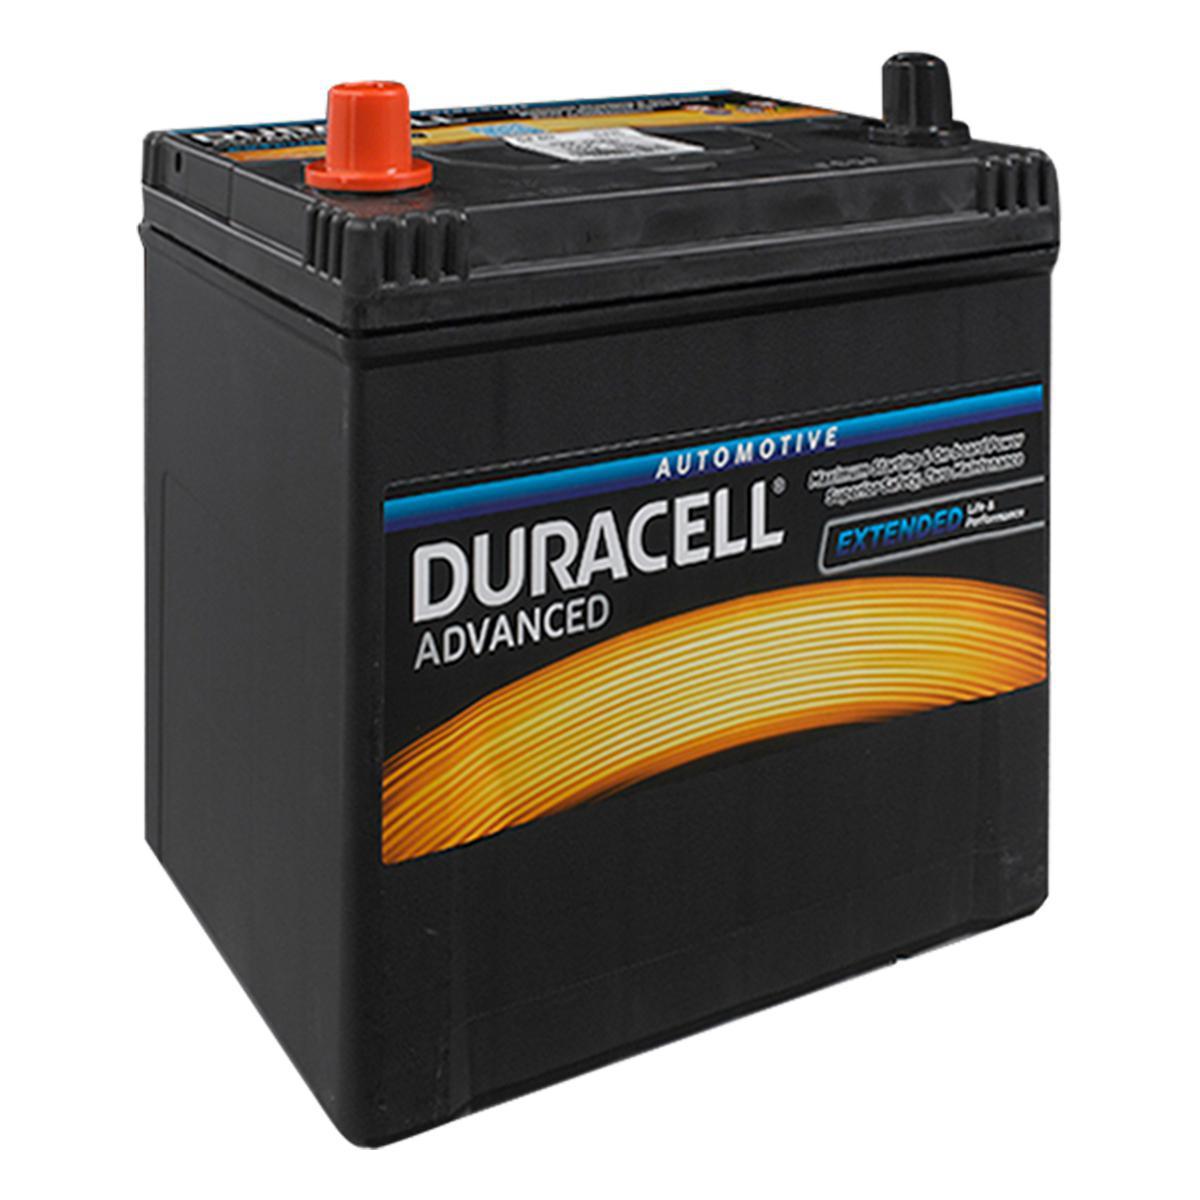 Duracell 043 / DA45L Advanced Car Battery